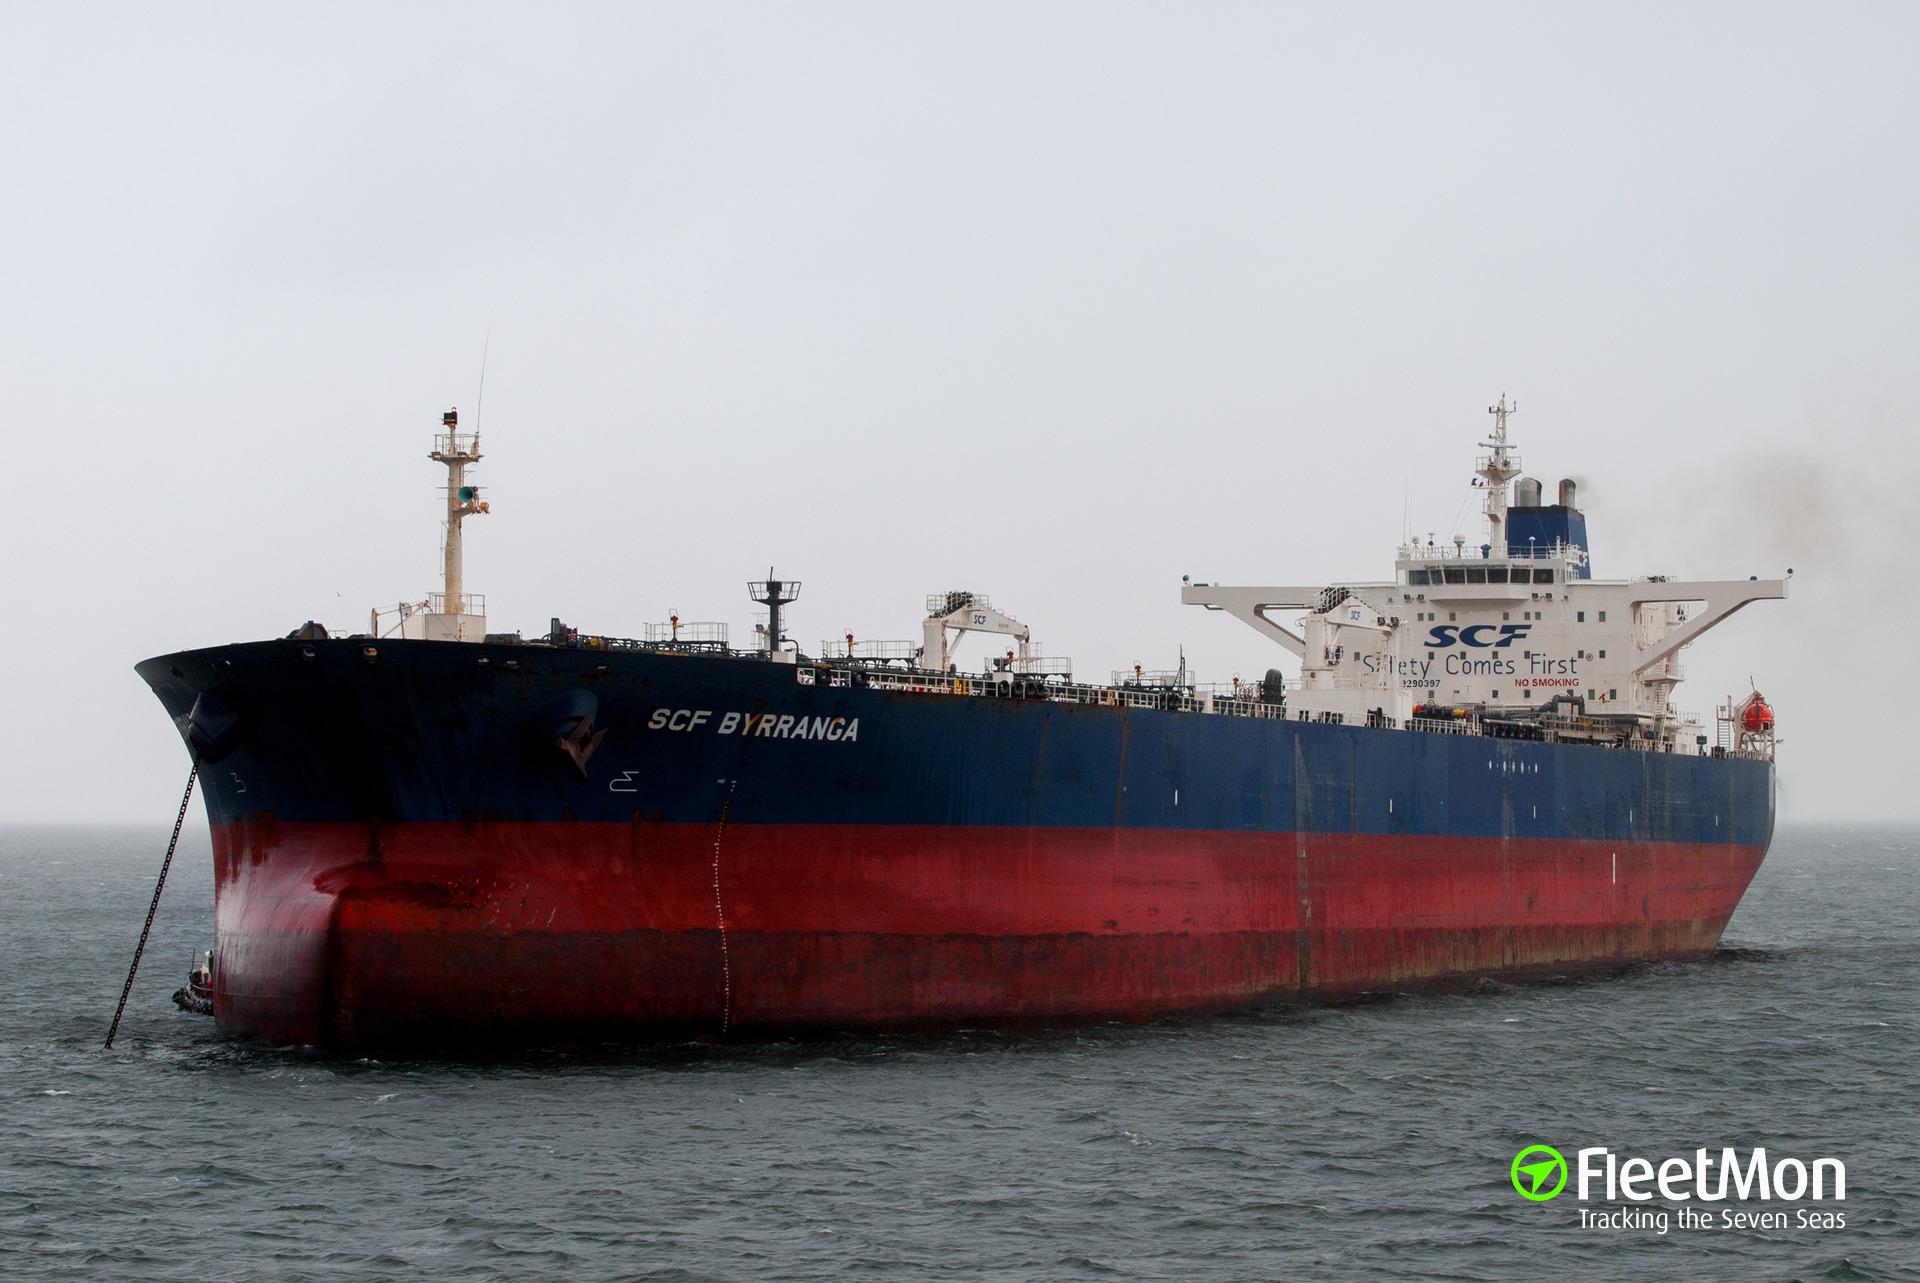 Update: U.S. won't confiscate Kurdish crude oil cargo